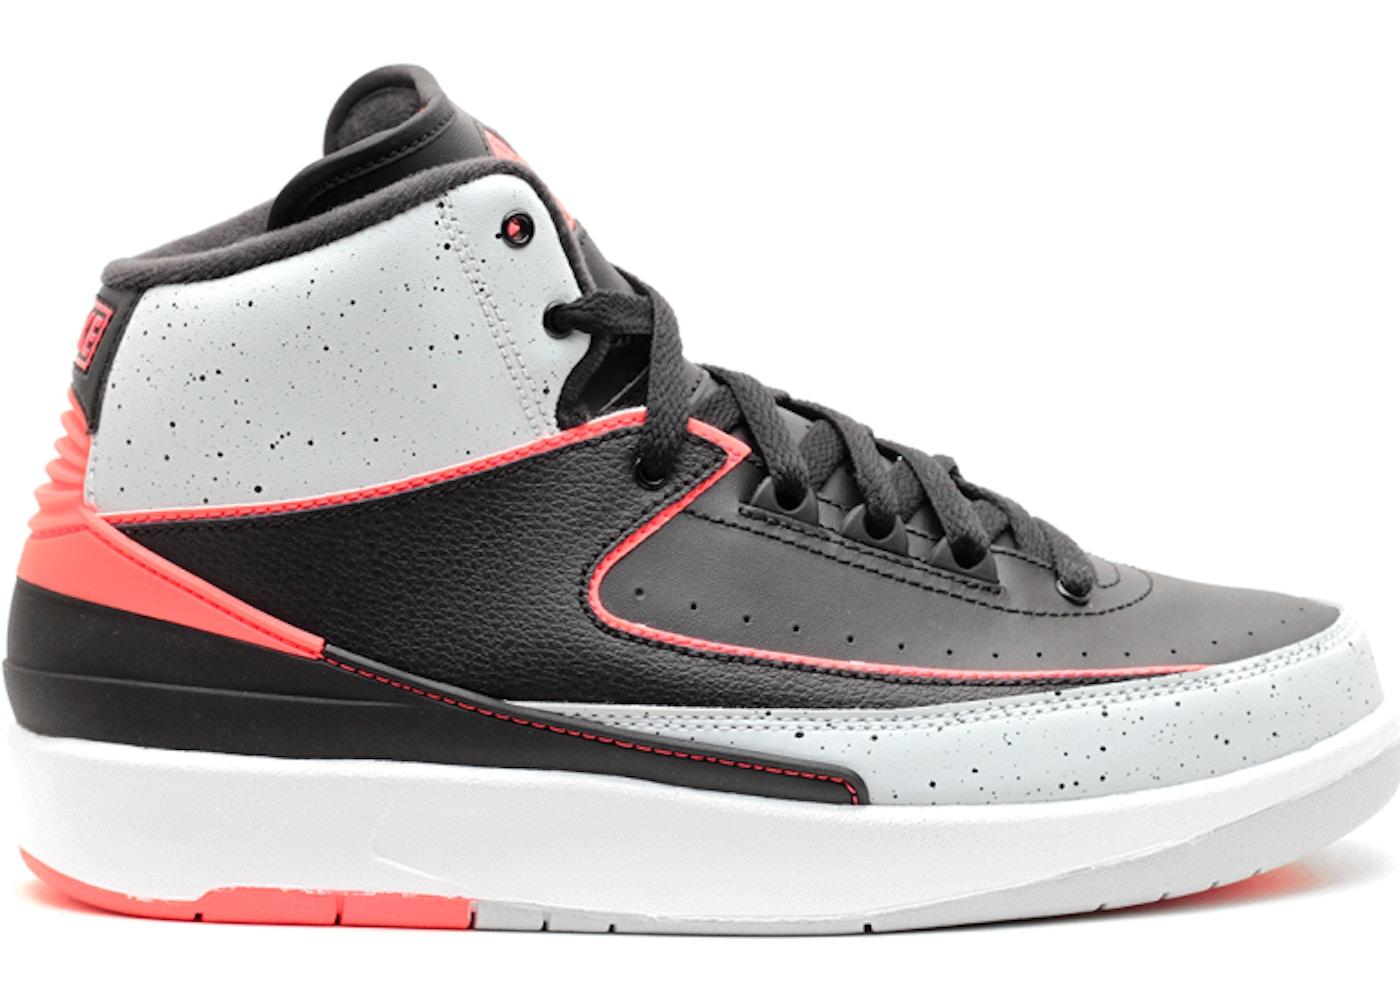 hot sale online f0823 c2026 Jordan 2 Retro Infrared 23 (GS)